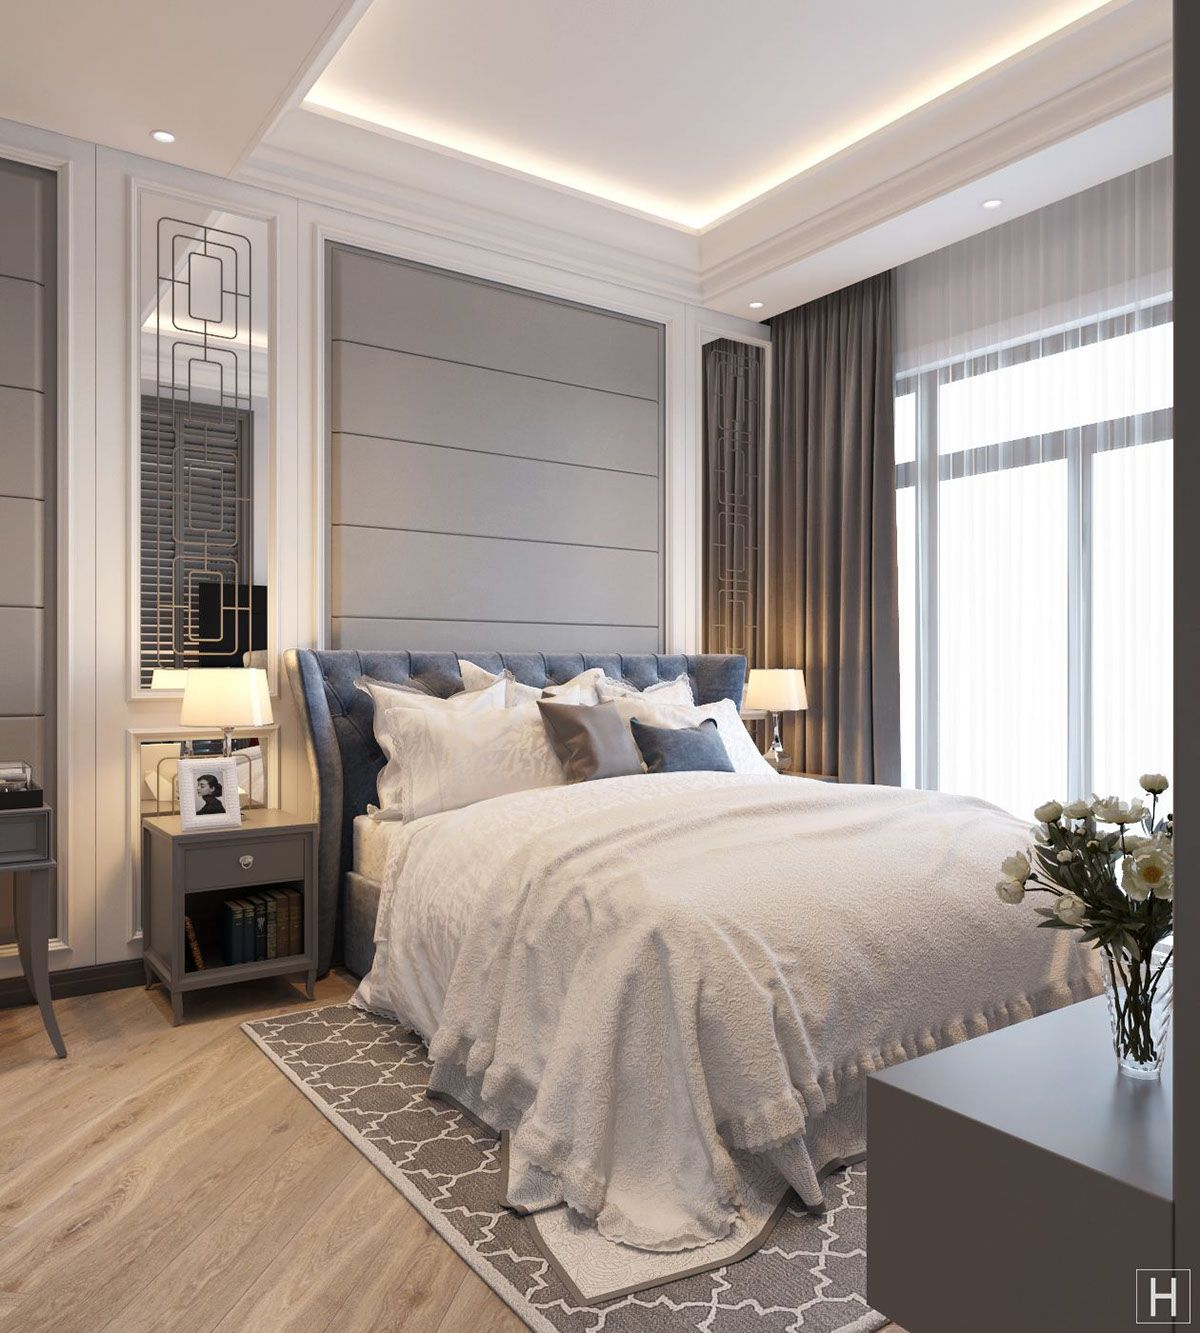 Luxury Master Bedroom Dubai On Behance: Q7 - LUXURY BEDROOM !!! On Behance